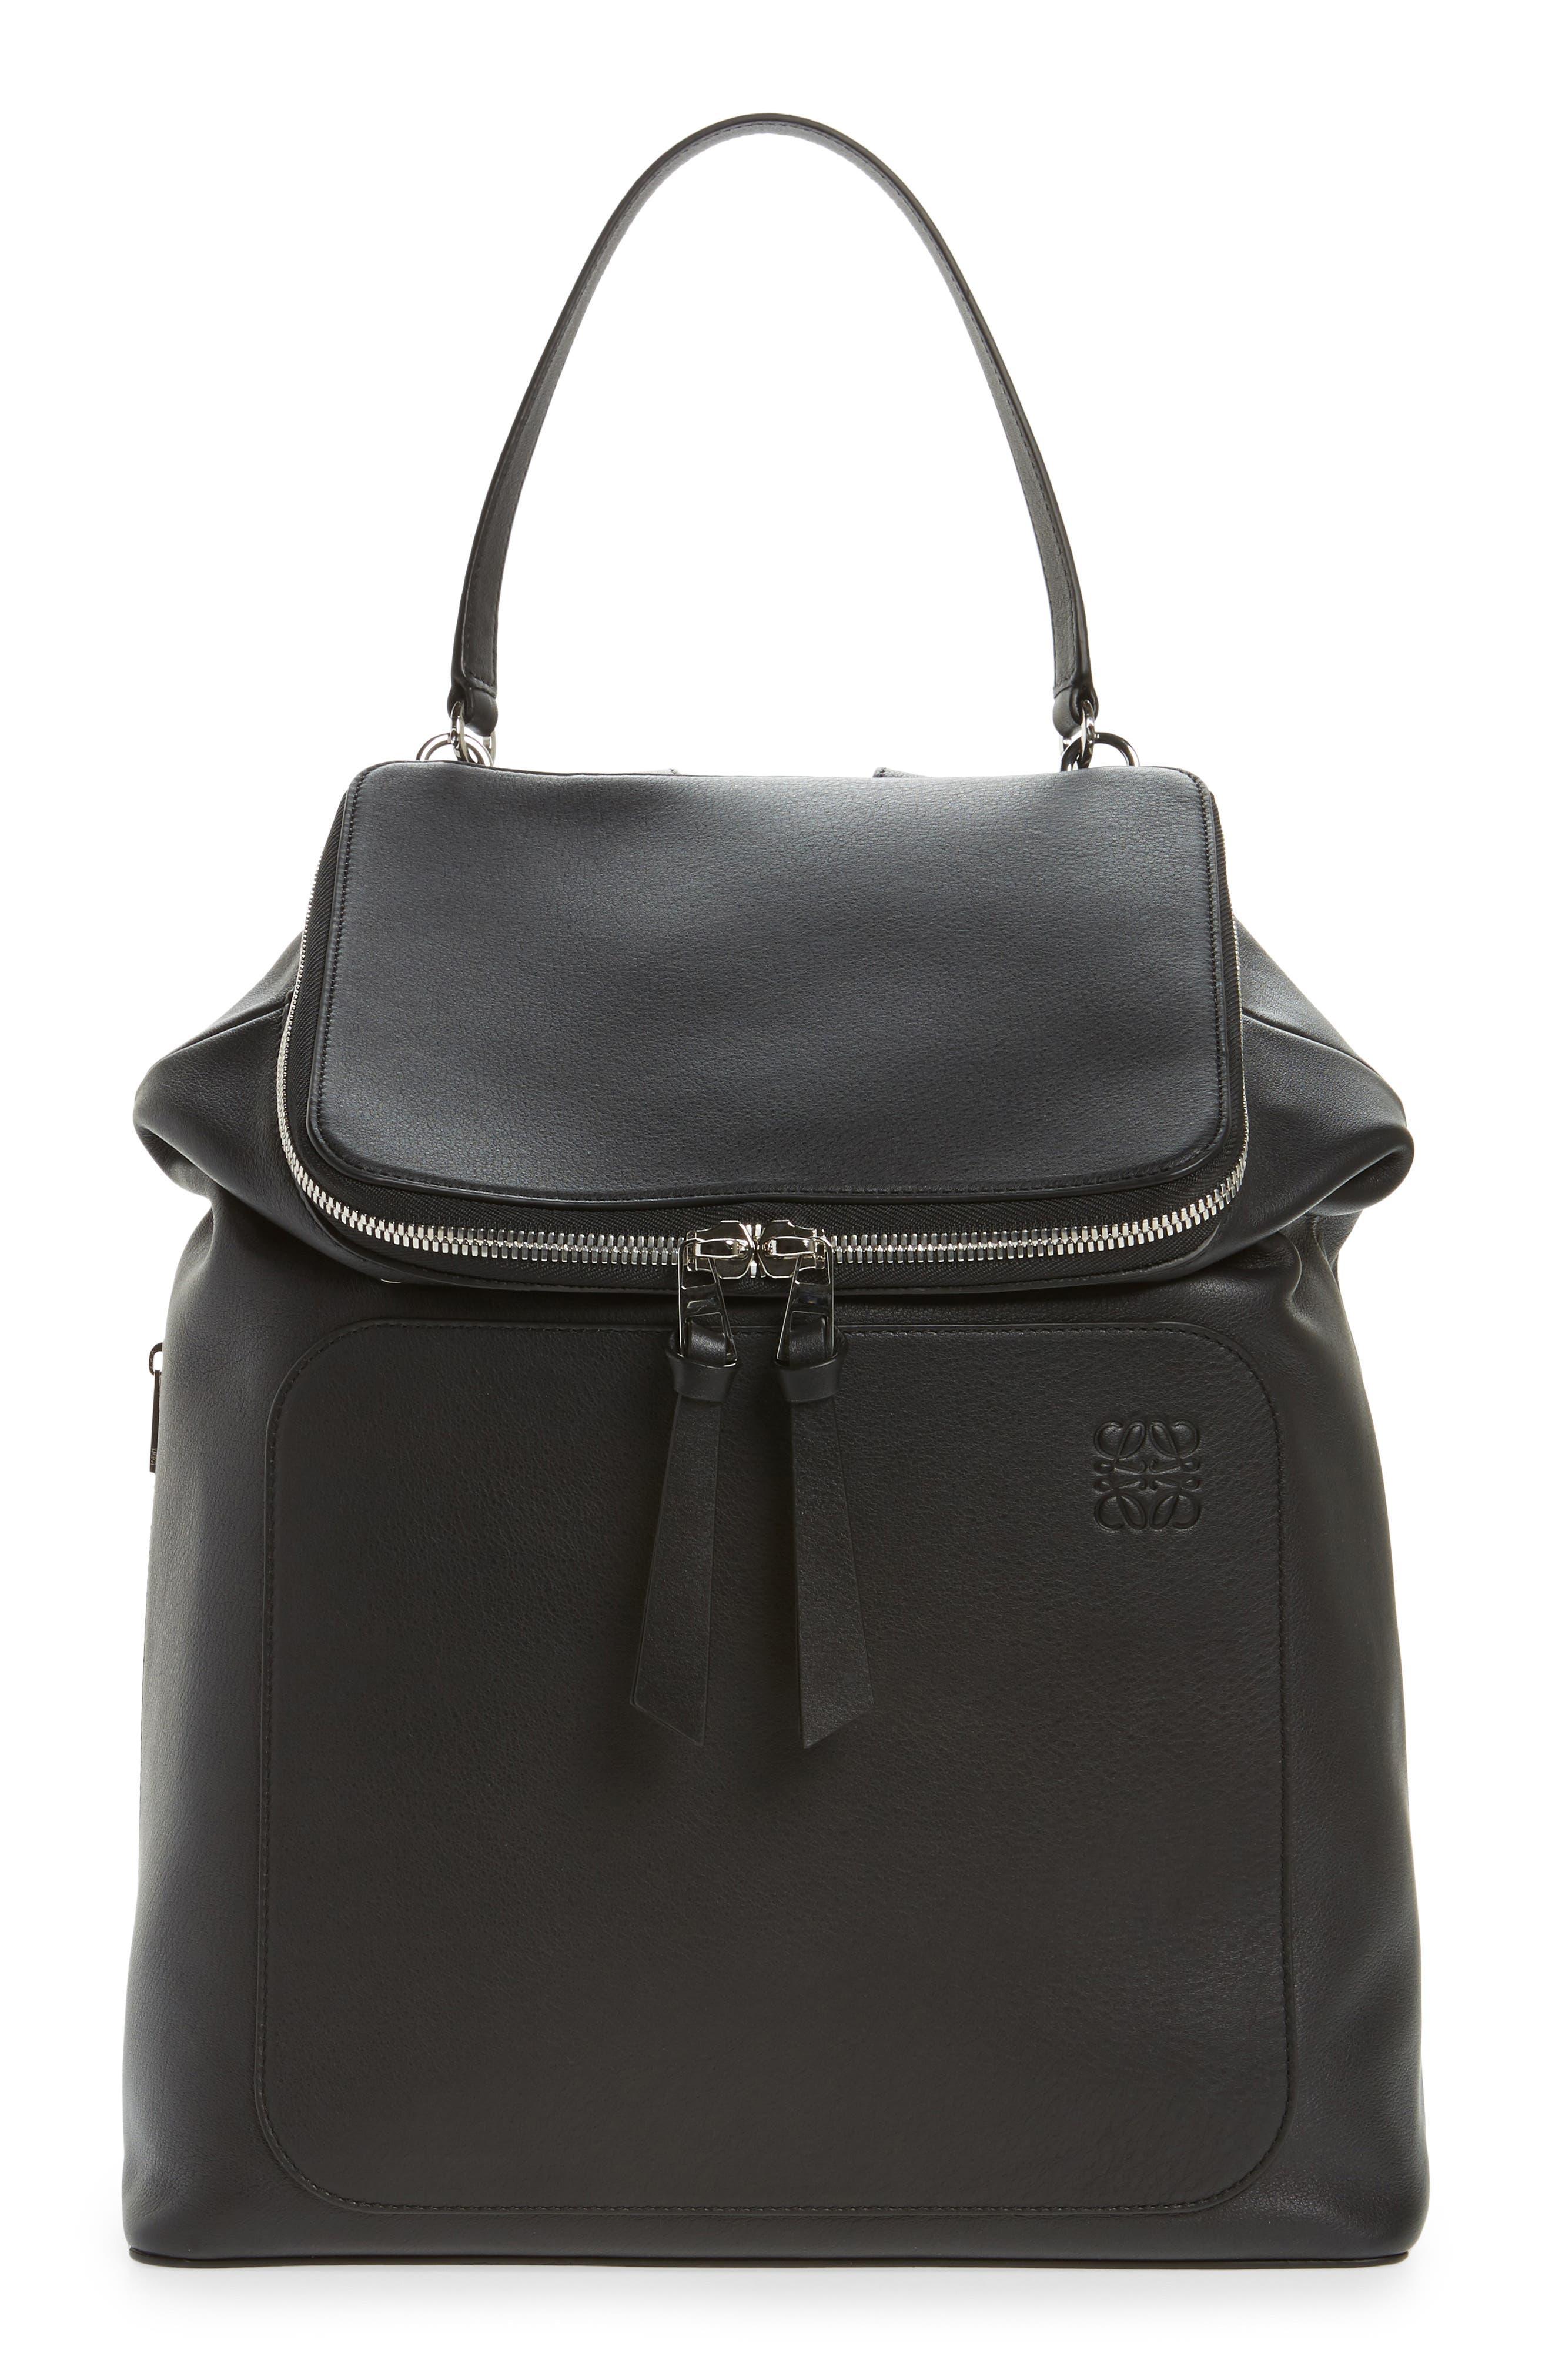 1244dd7dcf269 Buy bags for men - Best men's bags shop - Cools.com